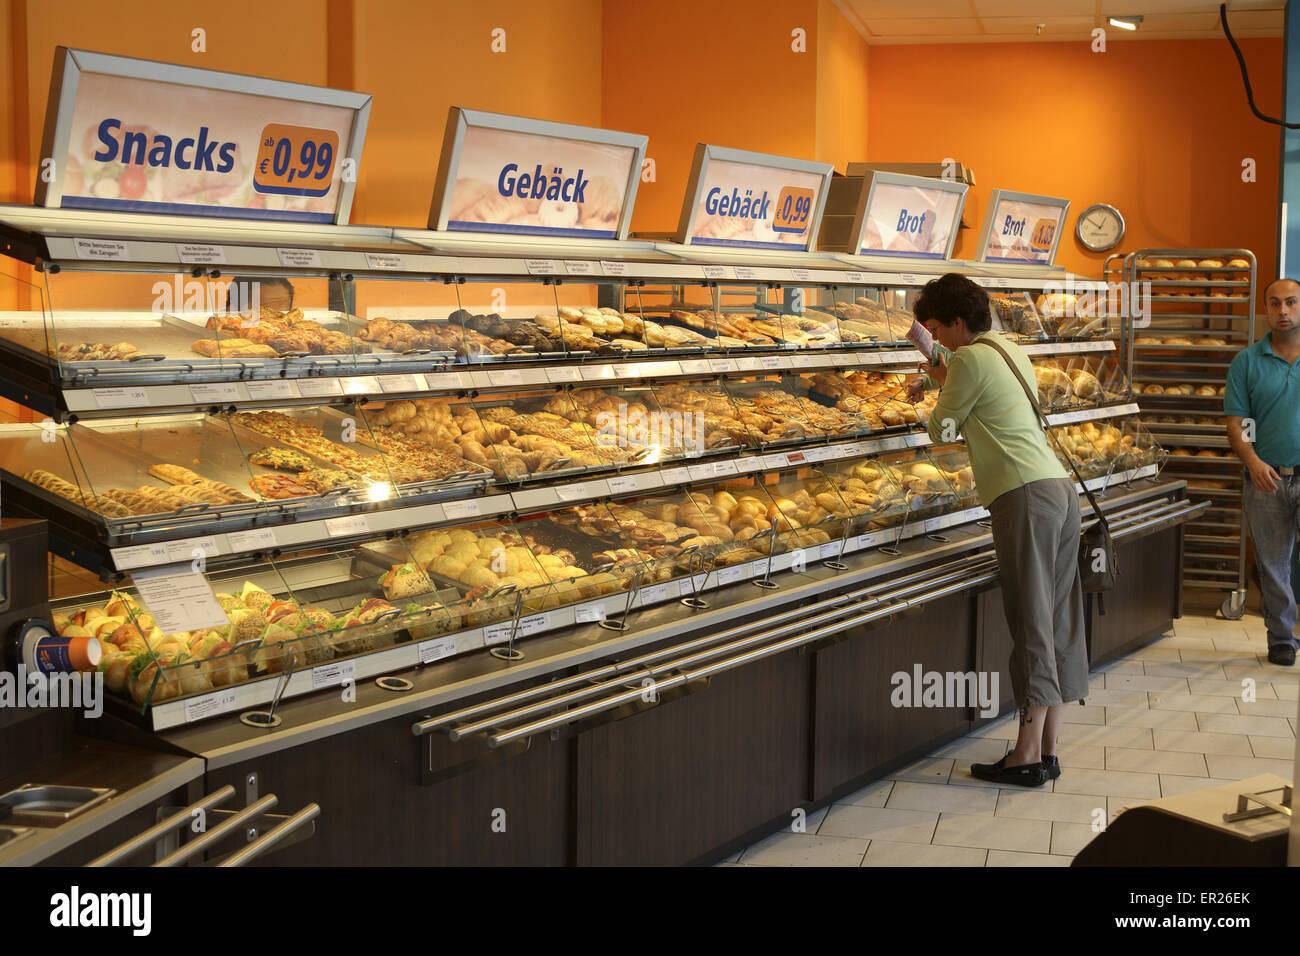 DEU Germany Cologne Store Of The Bakery Back Werk At Main Station Deutschland Koeln Filiale Der Baeckerei W